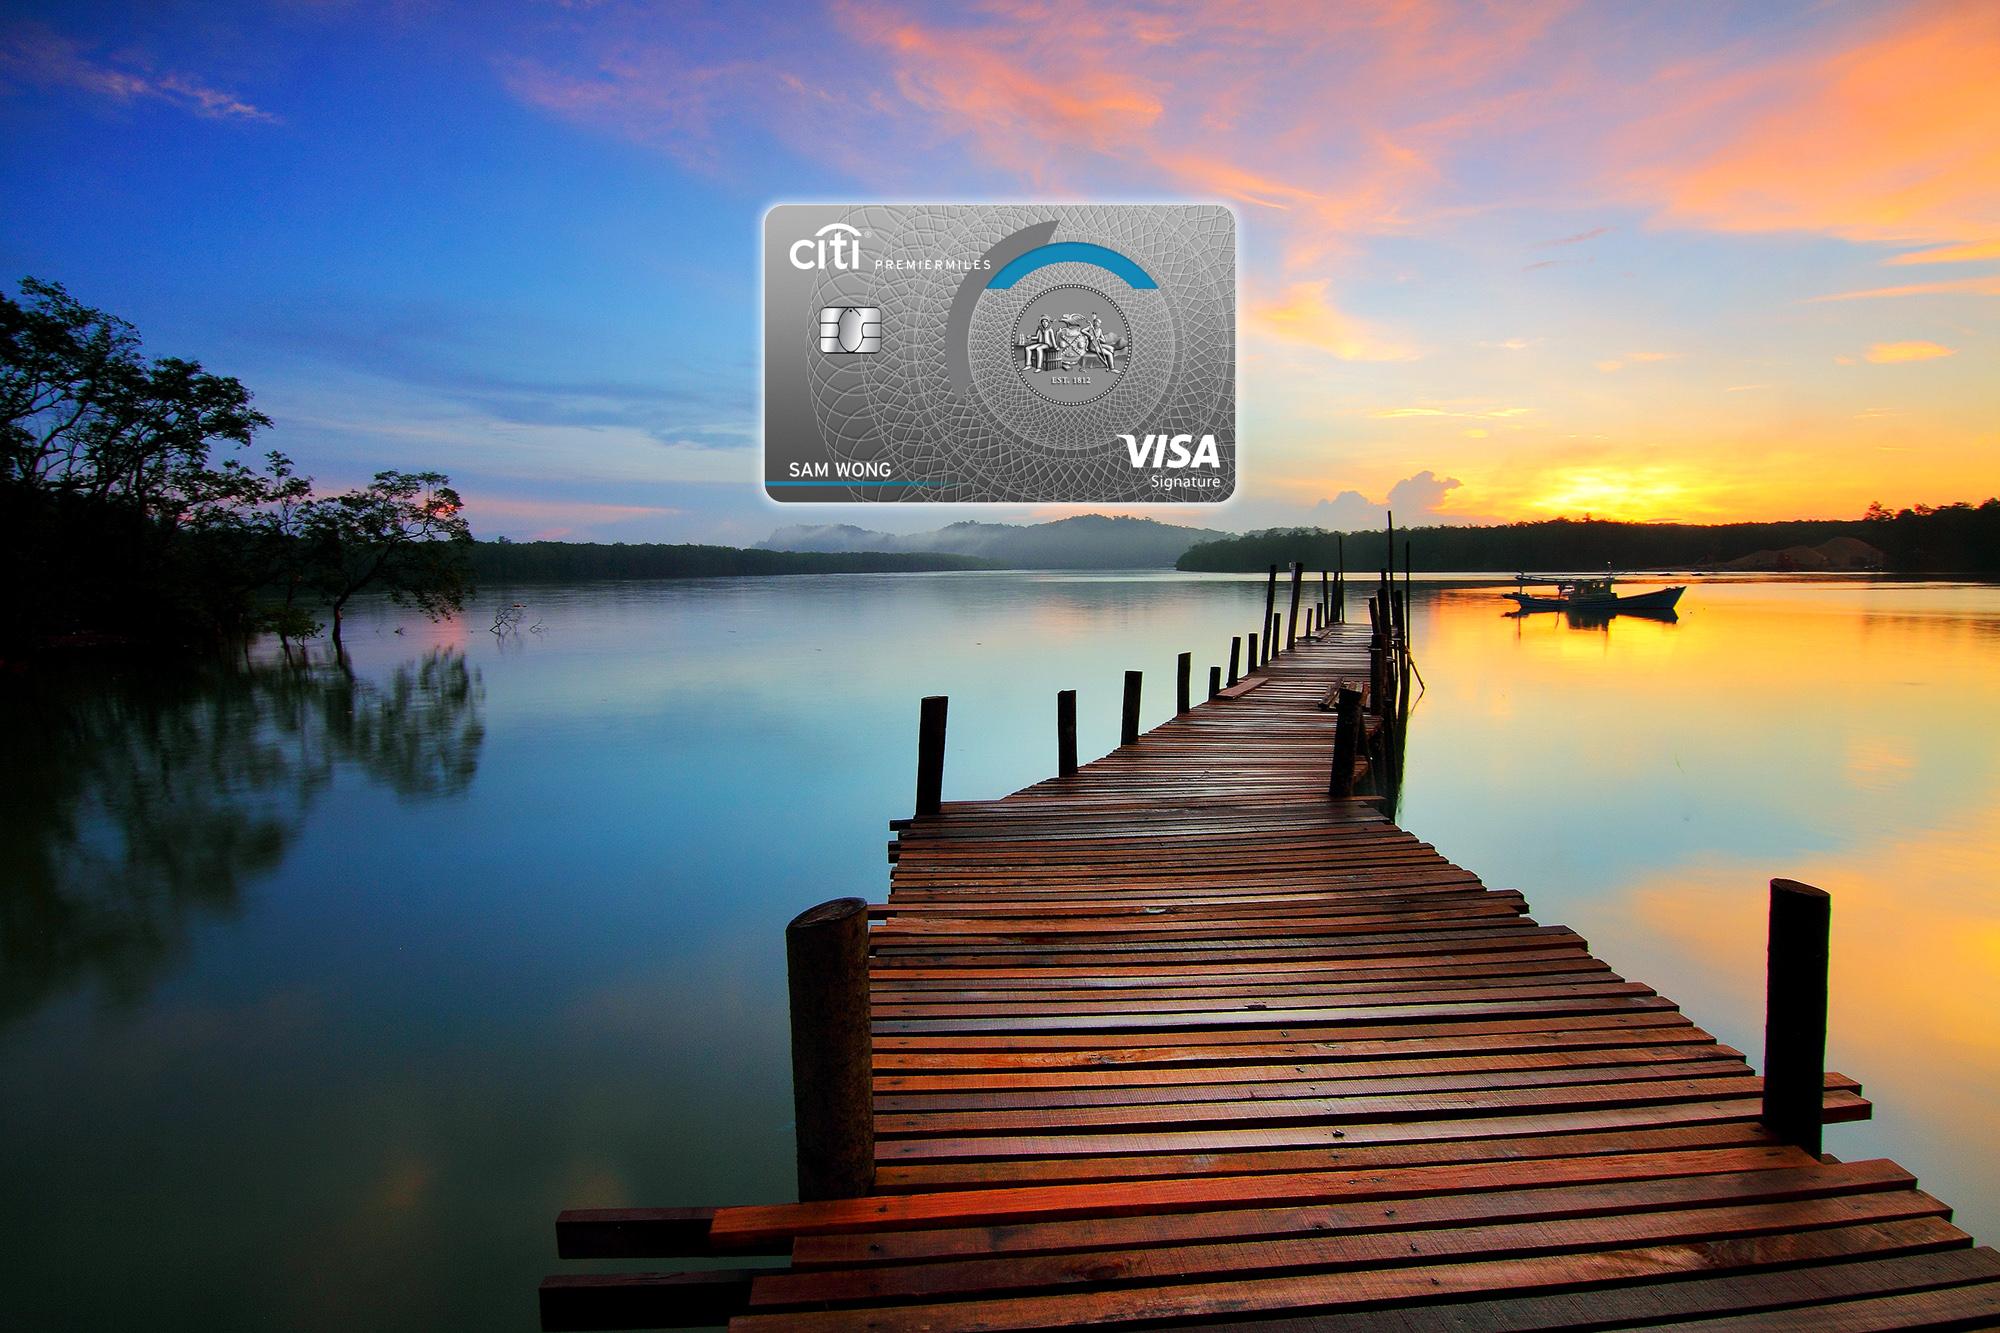 Citi extends PremierMiles Visa 21,000 miles sign-up bonus to 30 September